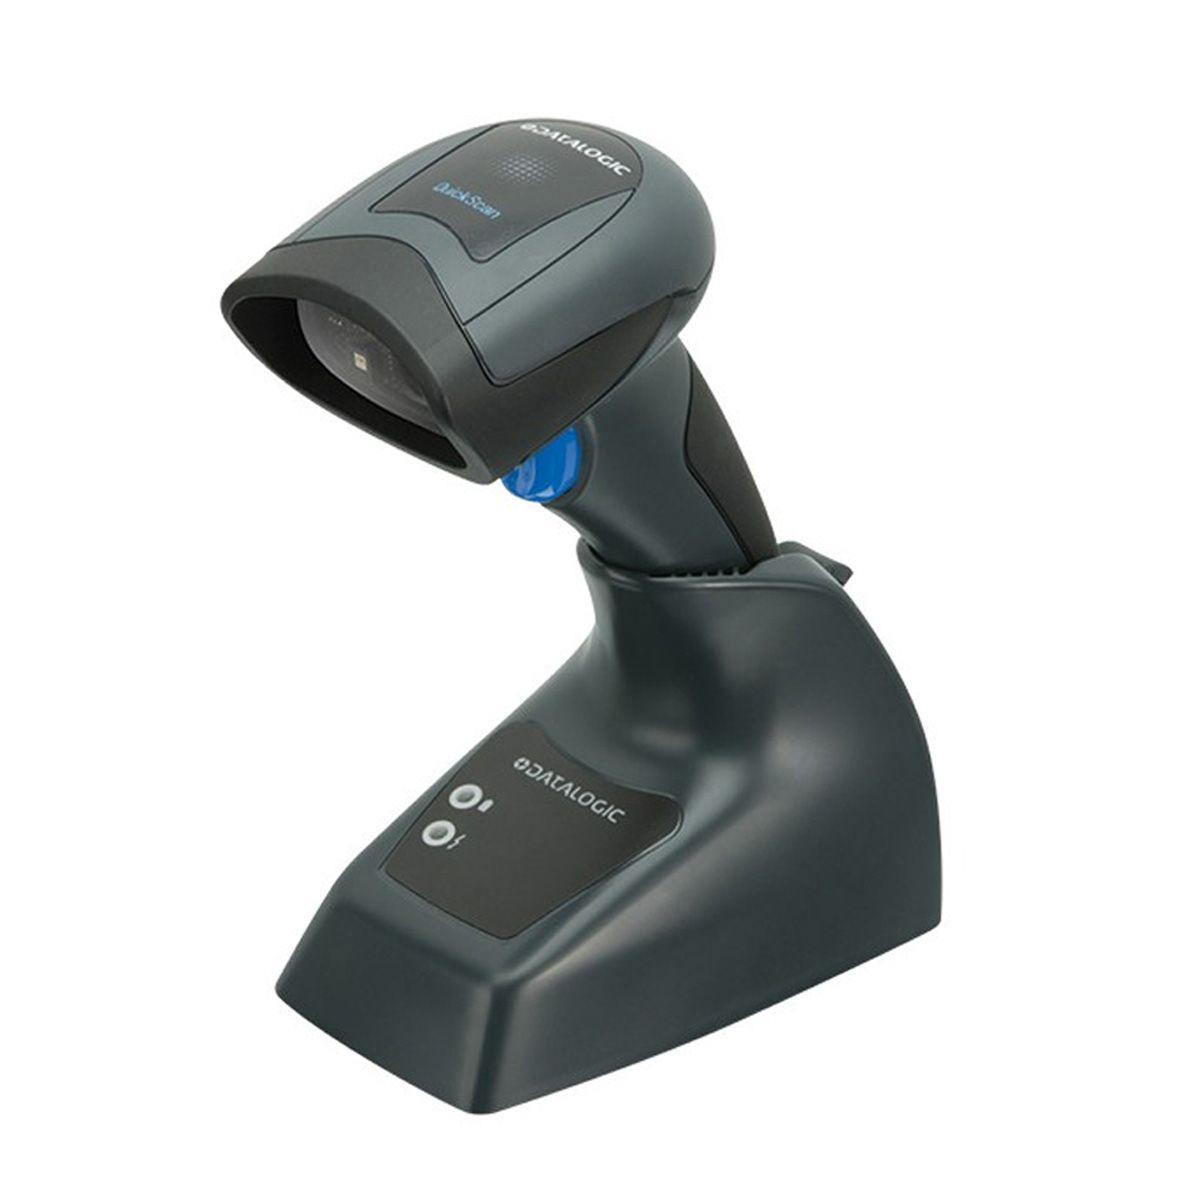 Leitor de Código de Barras Sem Fio QuickScan QBT2131 -  Datalogic